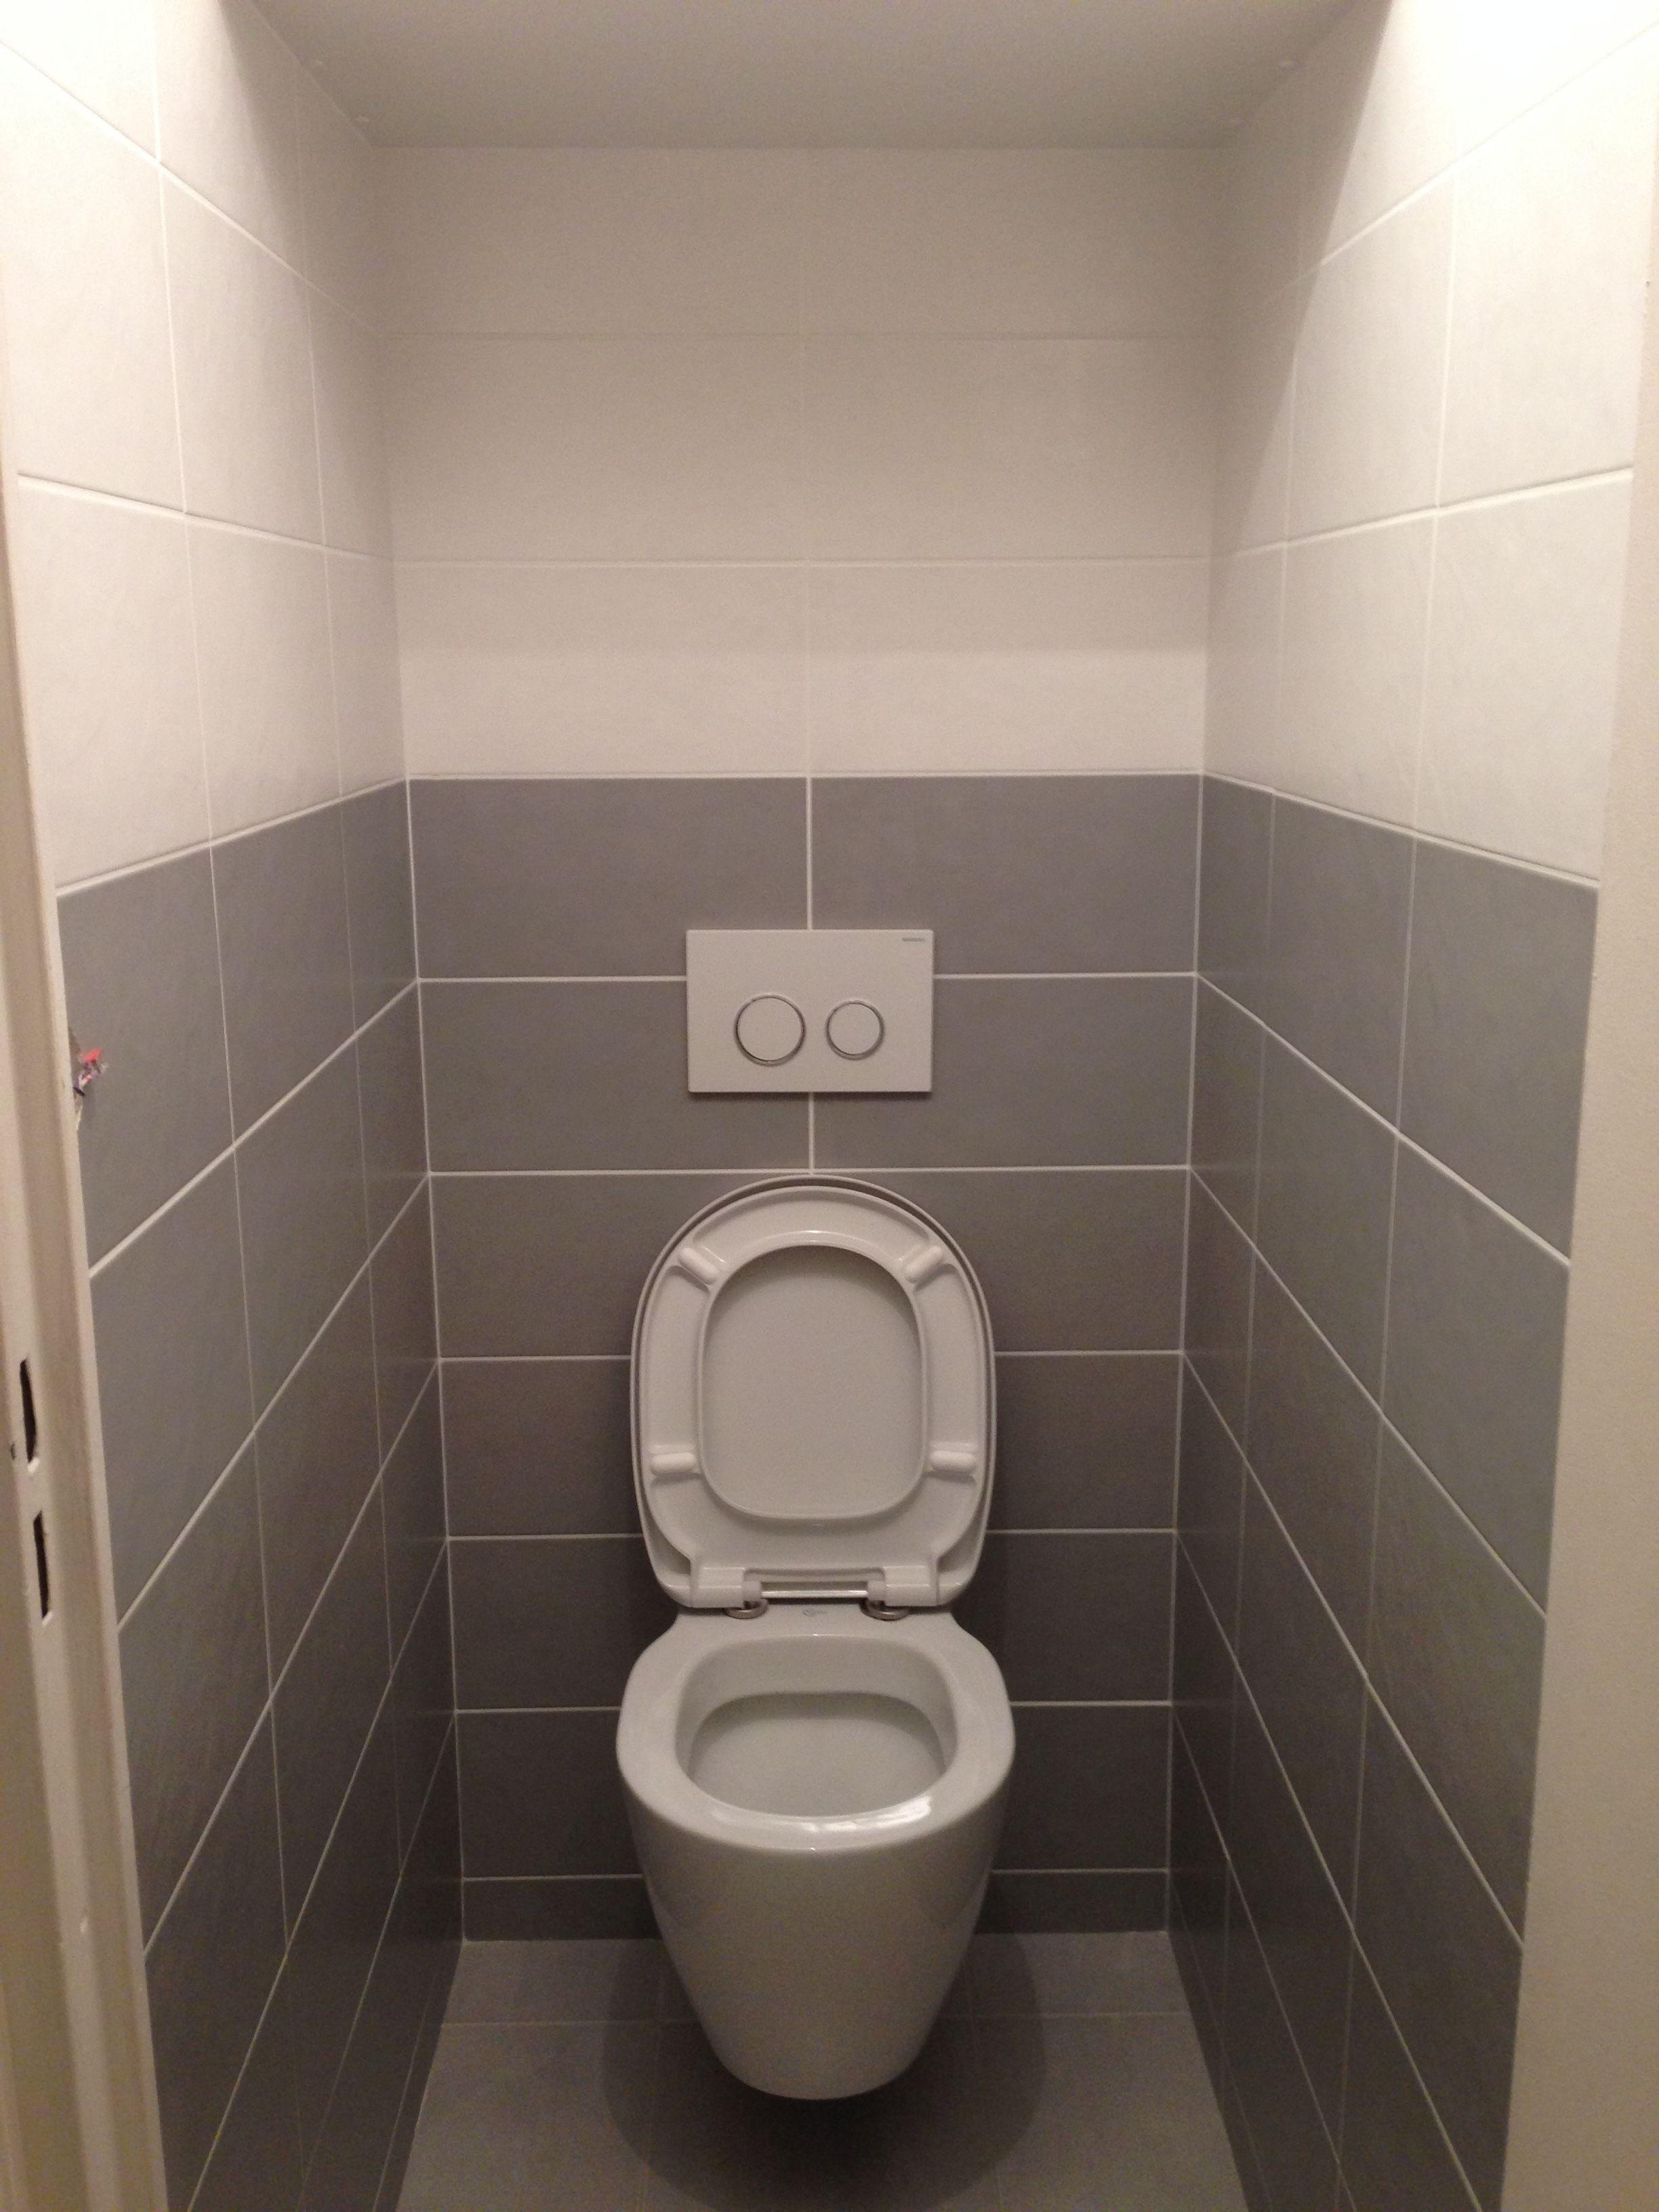 Afficher l\'image d\'origine | WC | Pinterest | Poser du carrelage ...